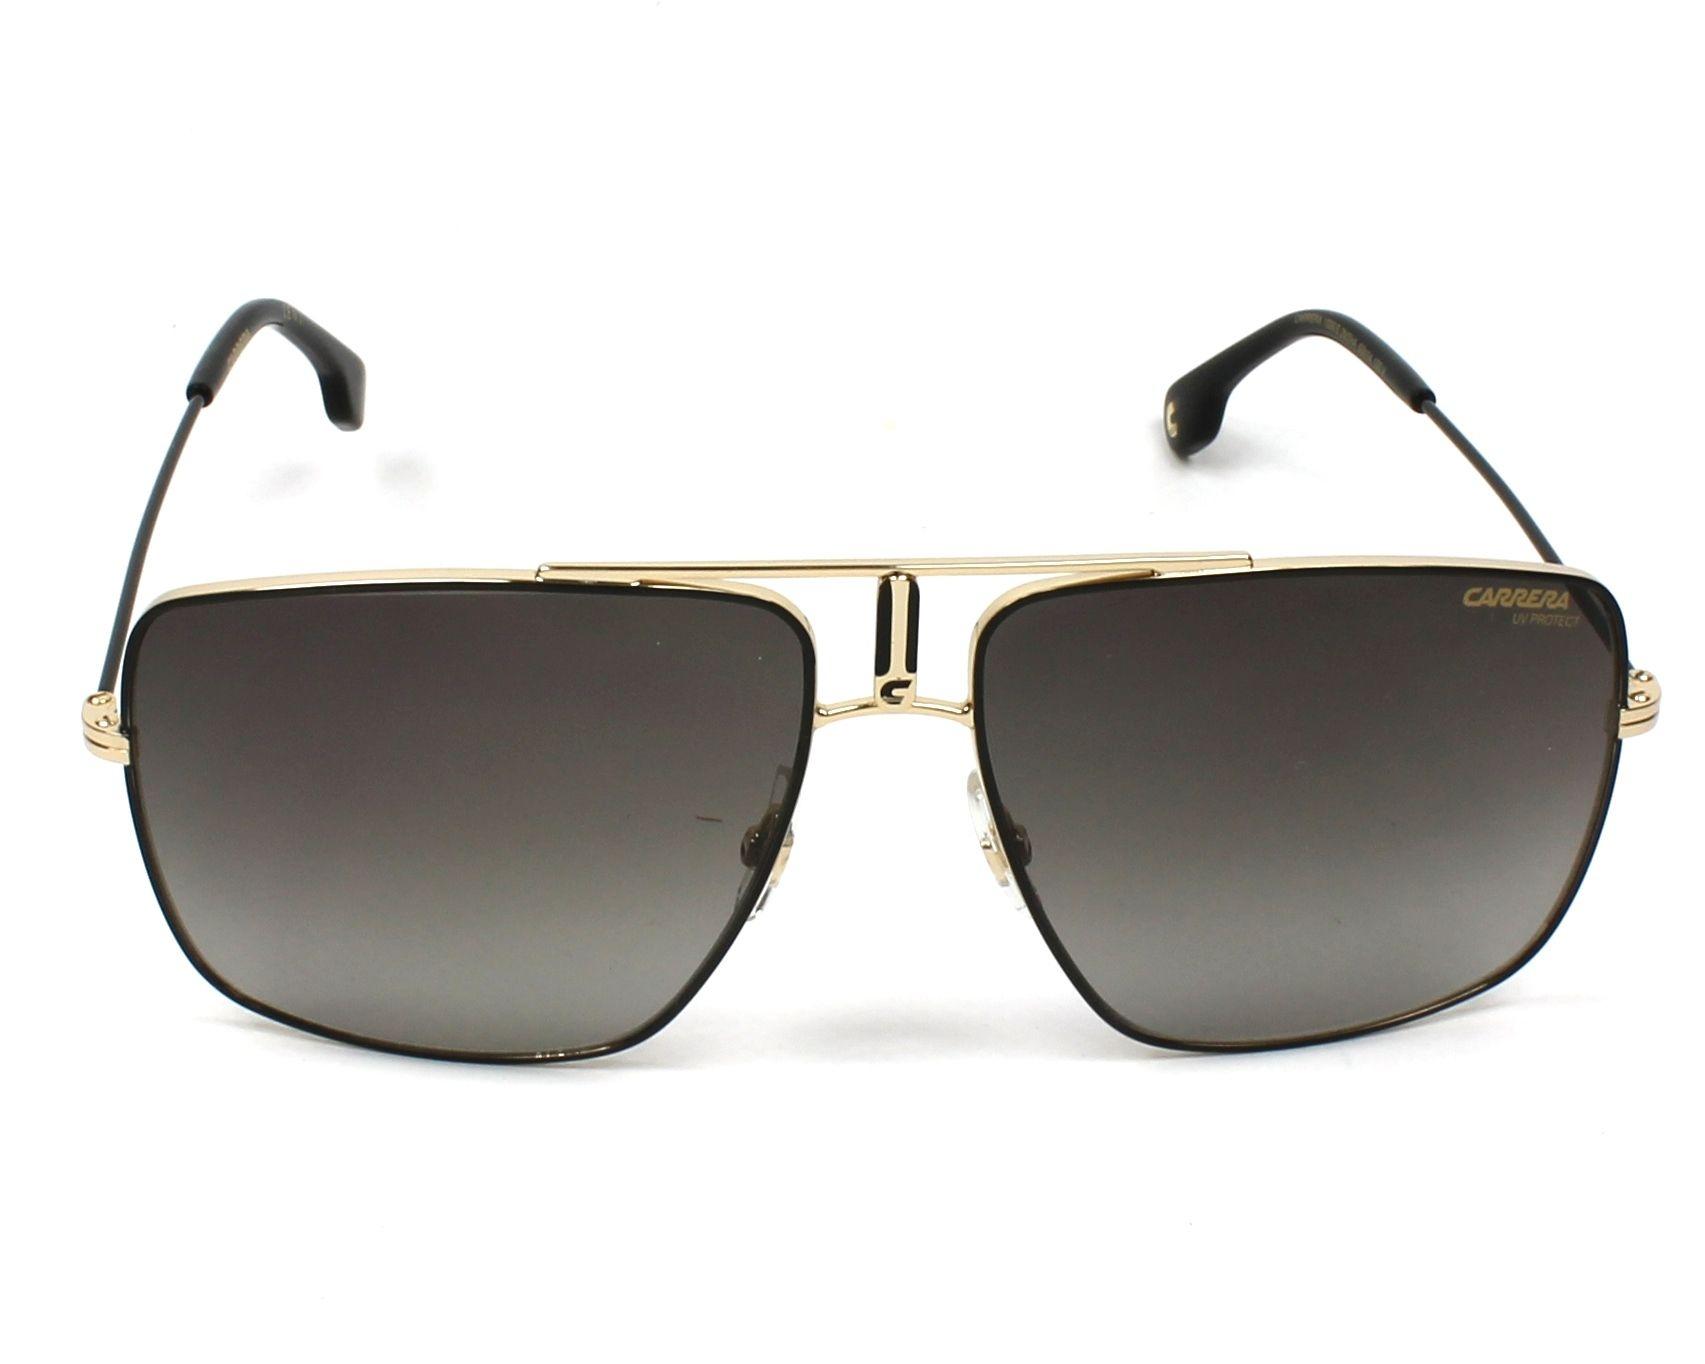 4cccd328731c15 Sunglasses Carrera 1006-S 2M2 HA 60-14 Black Gold front view